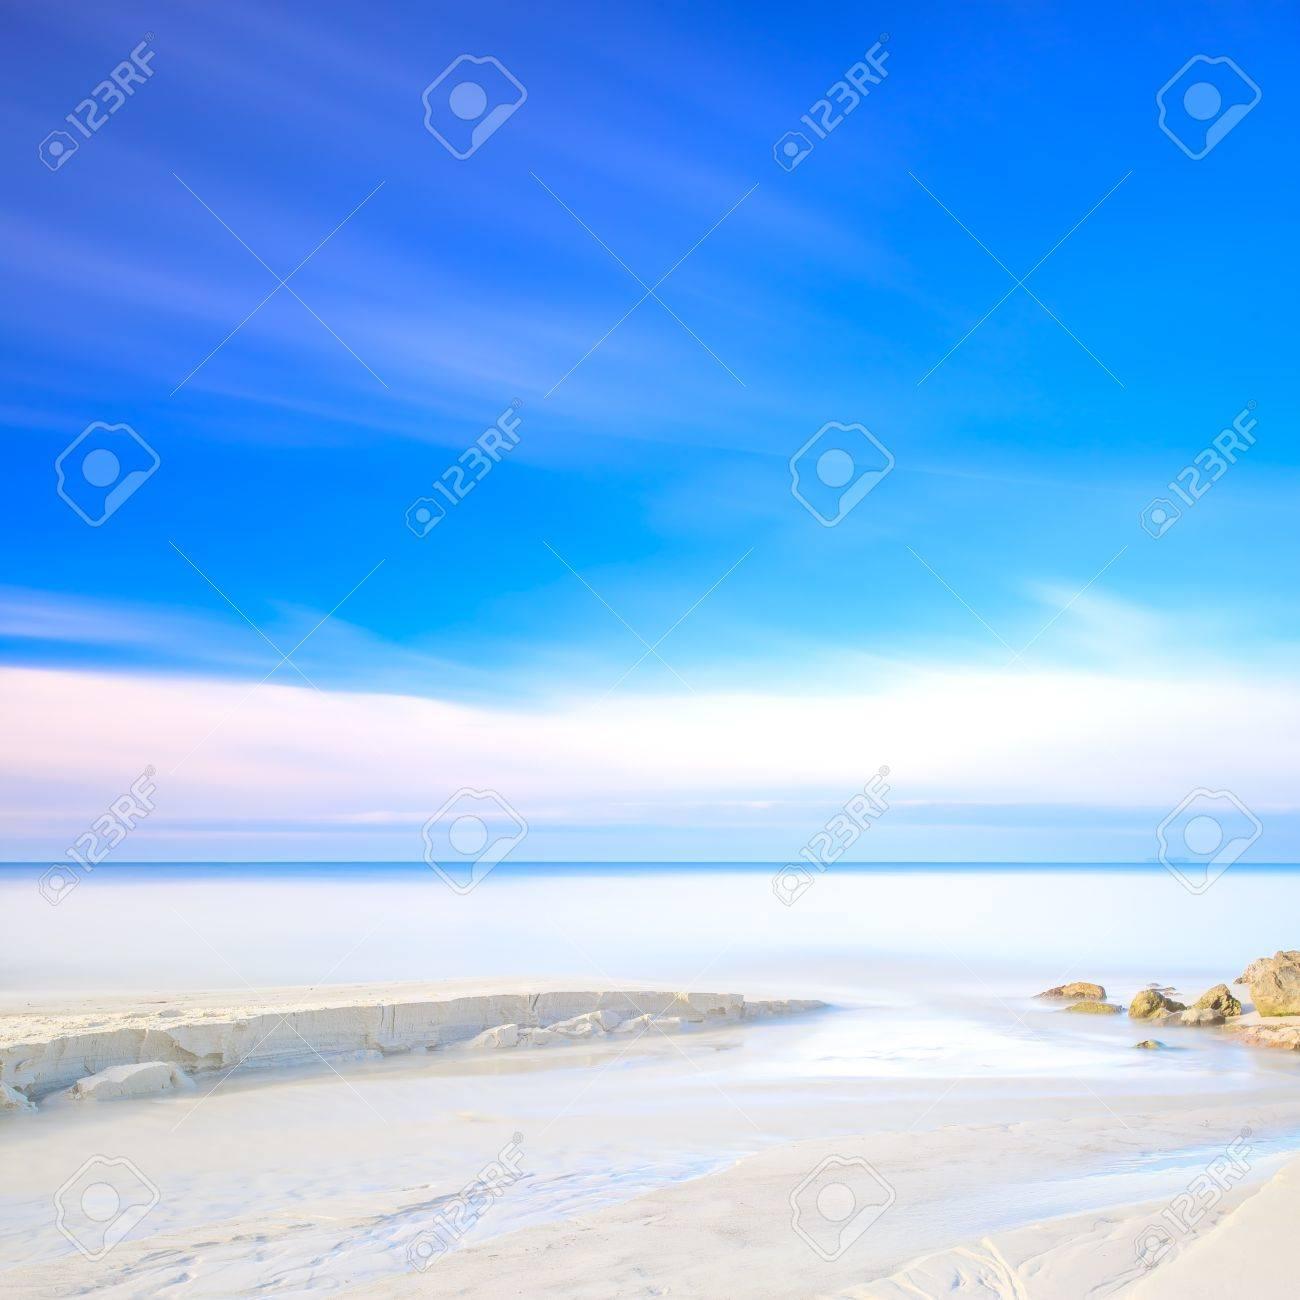 White sand dunes beach, rocks, blue ocean and sky on background Stock Photo - 17811075